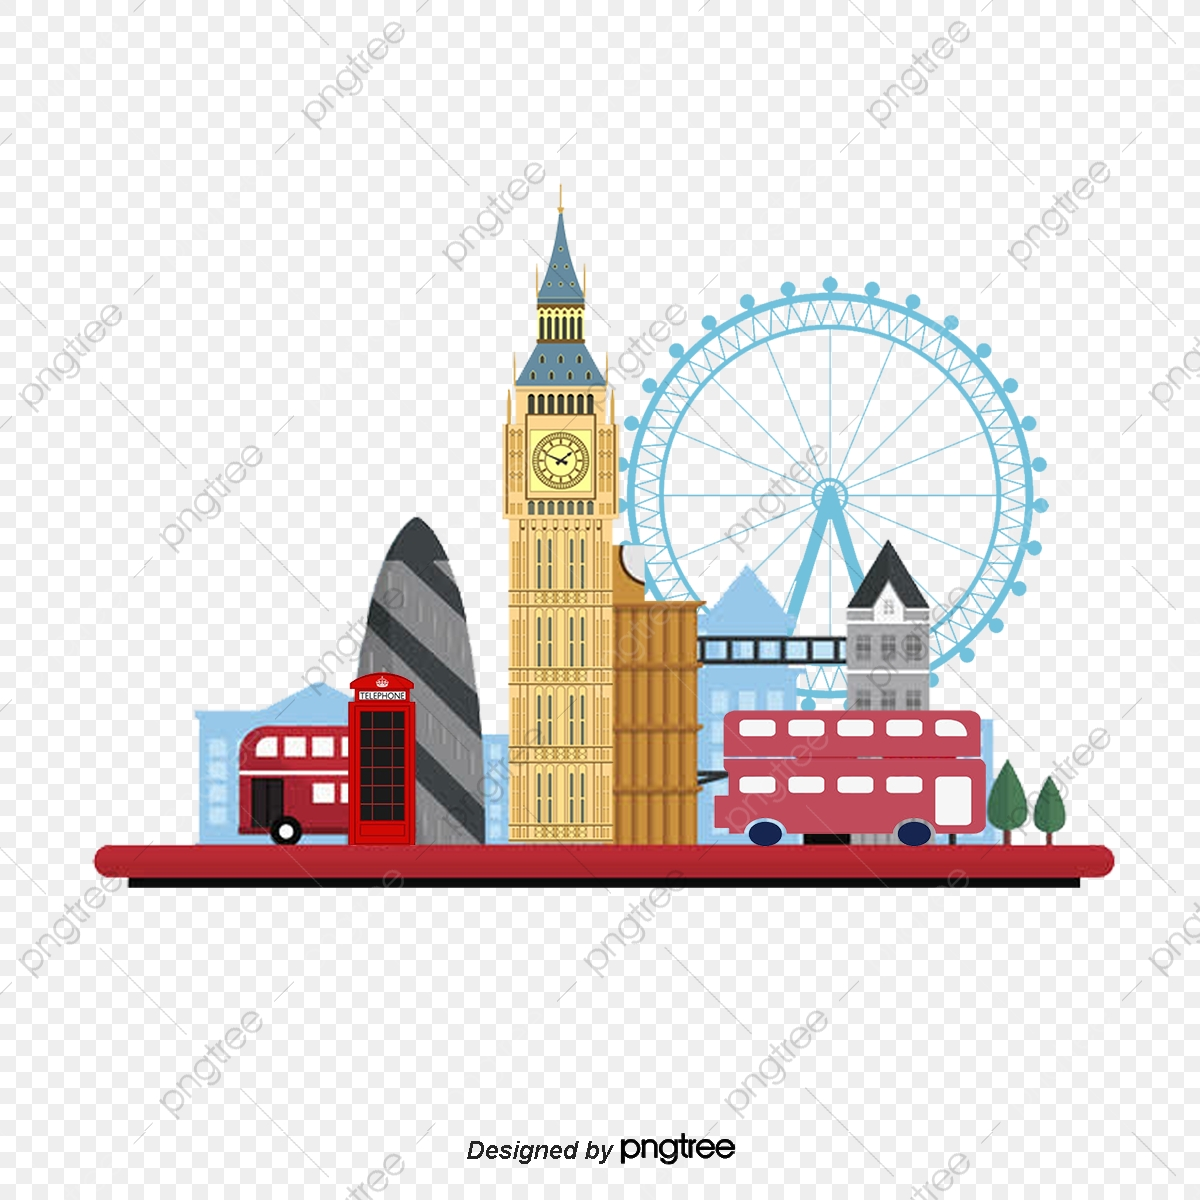 Vector London, London Vector, Big Ben, Telephone Booth PNG.